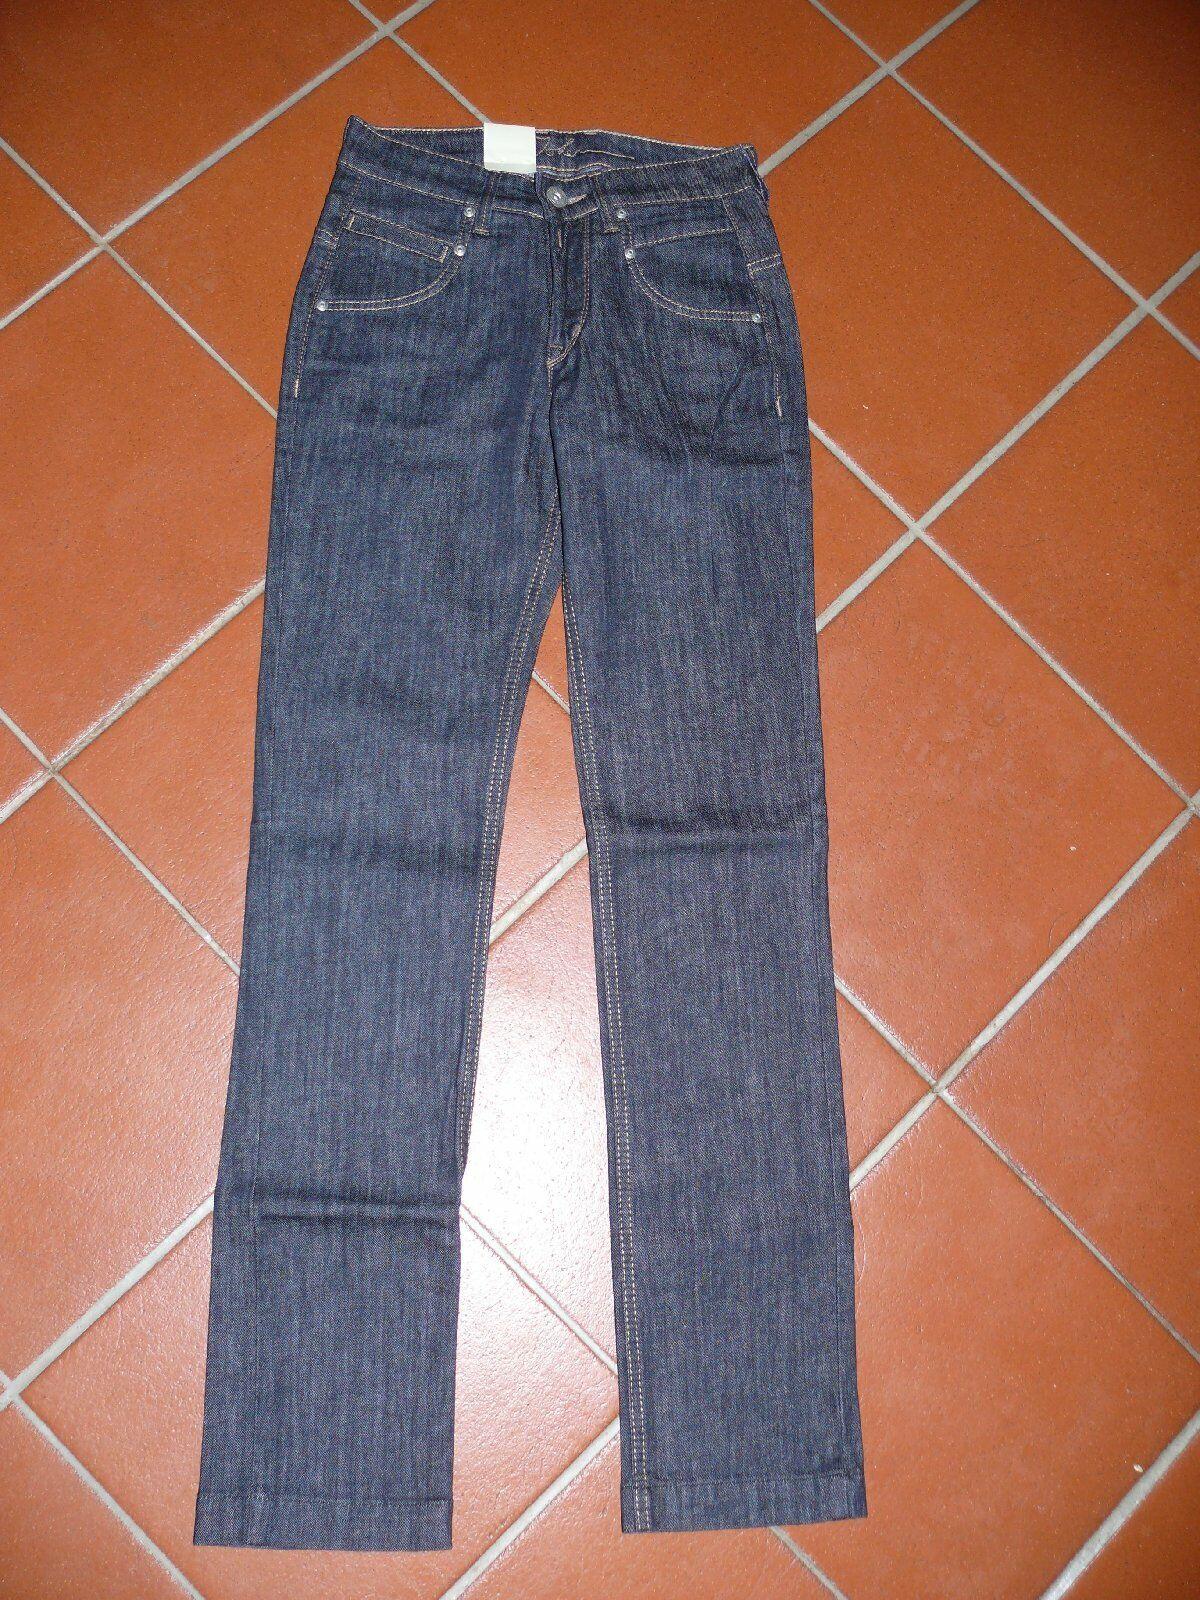 JOKER gerade Jeans ANGELINA perfect fit 6608 40 dunkelblue W26 L32 NEU